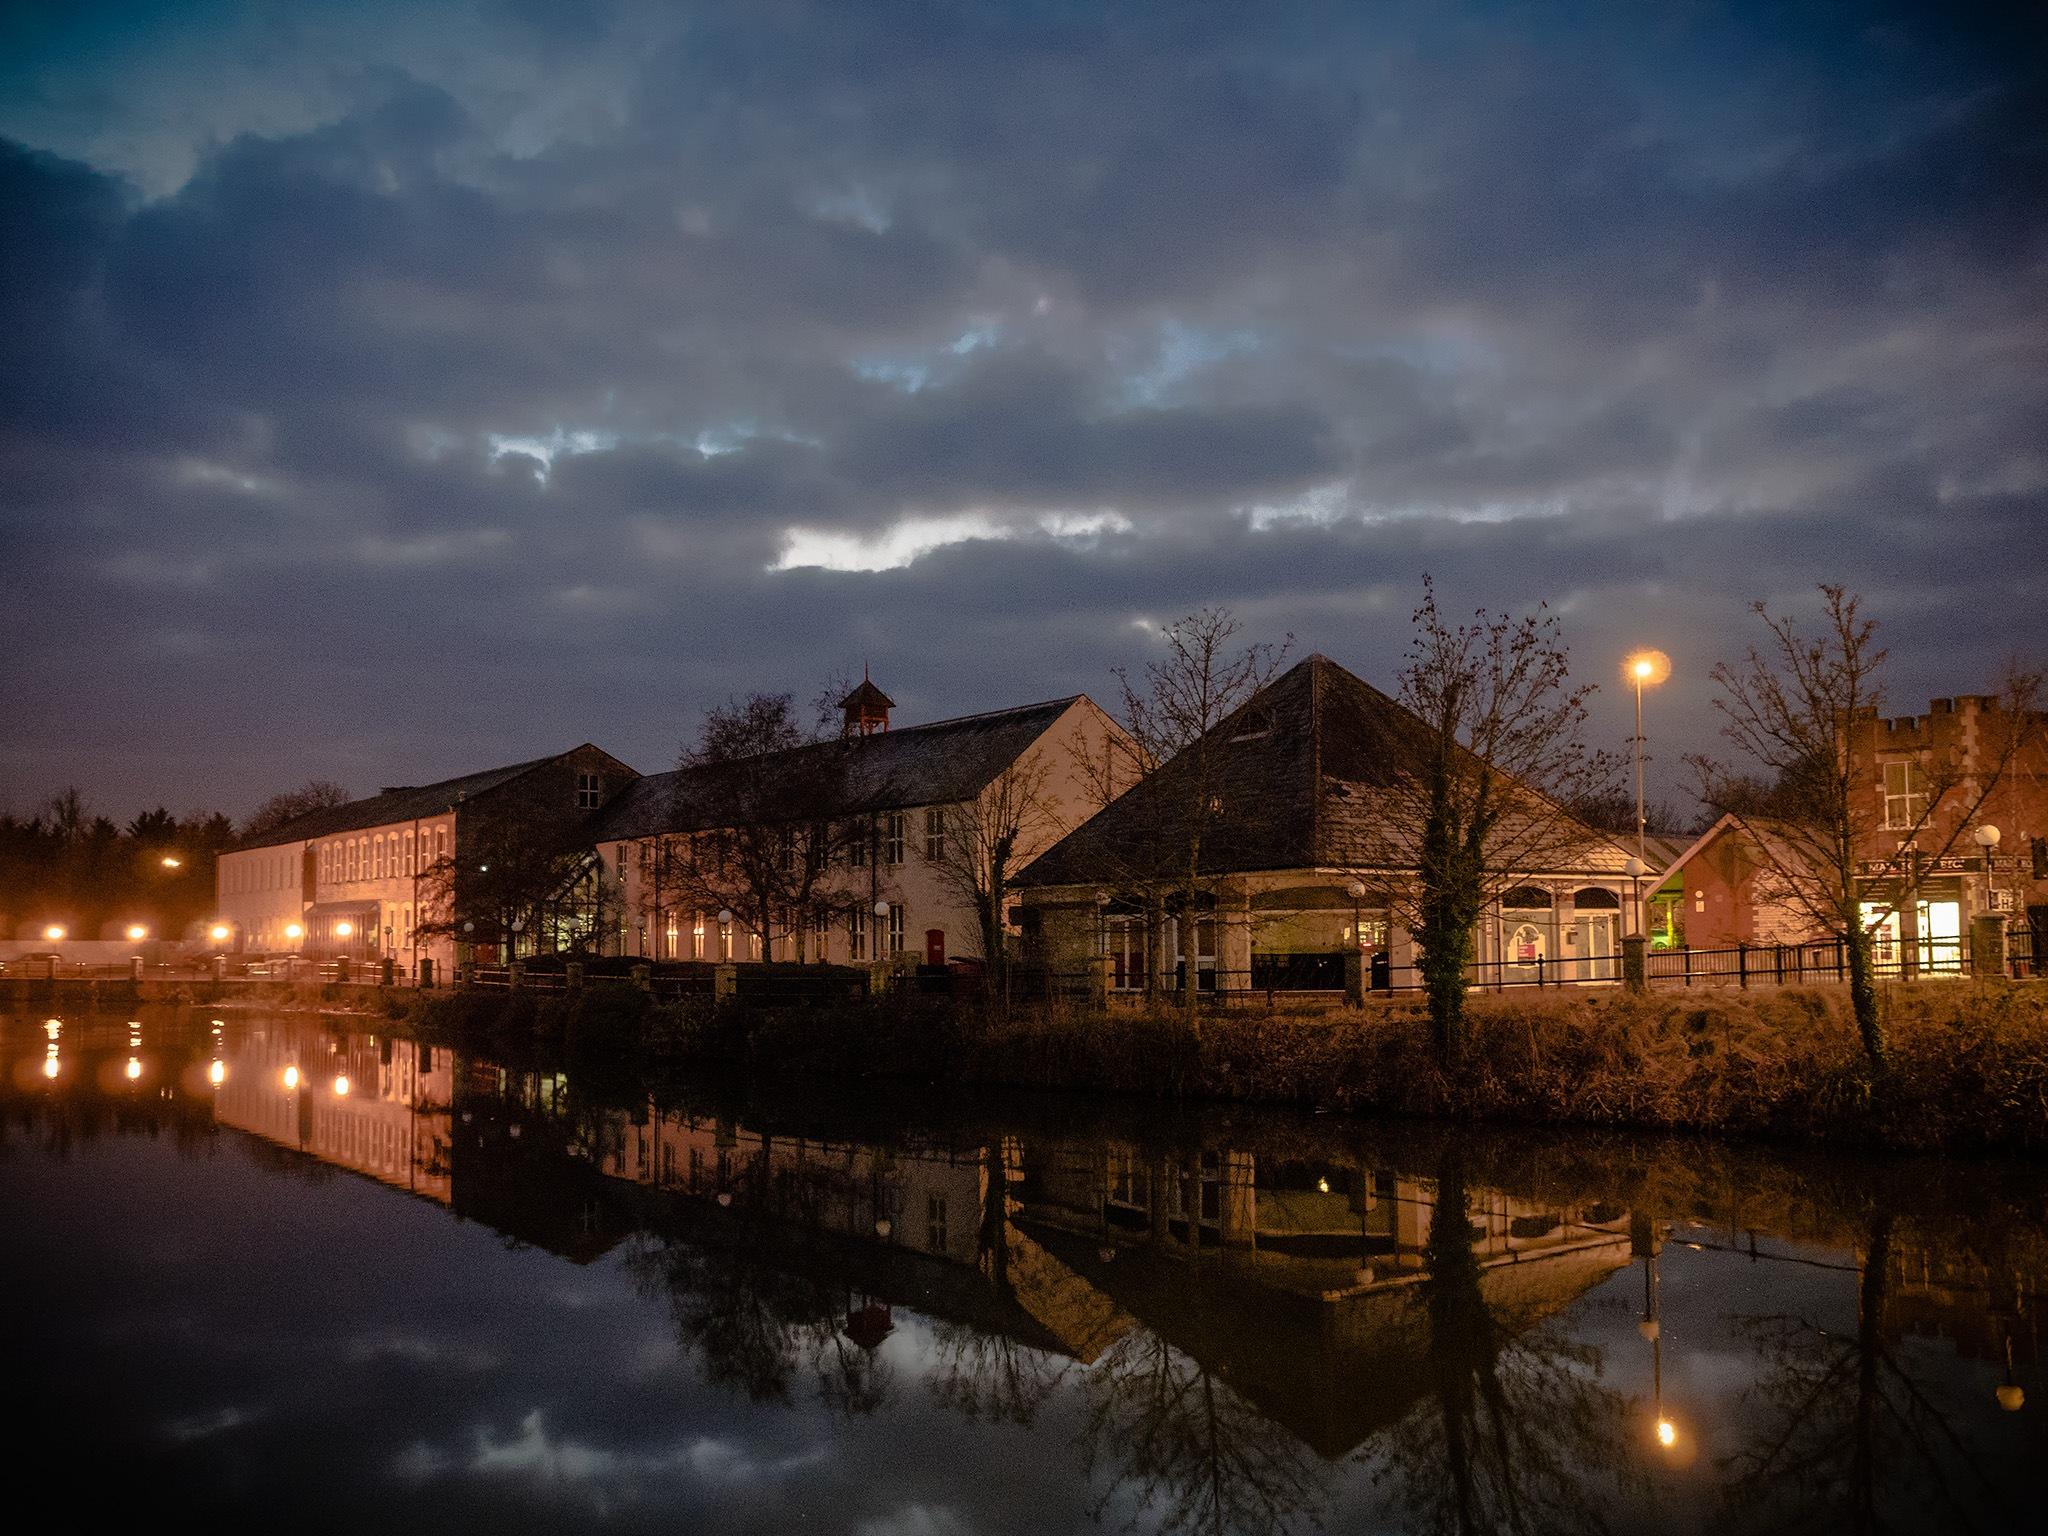 Chippenham at twilight by DavidNorfolk